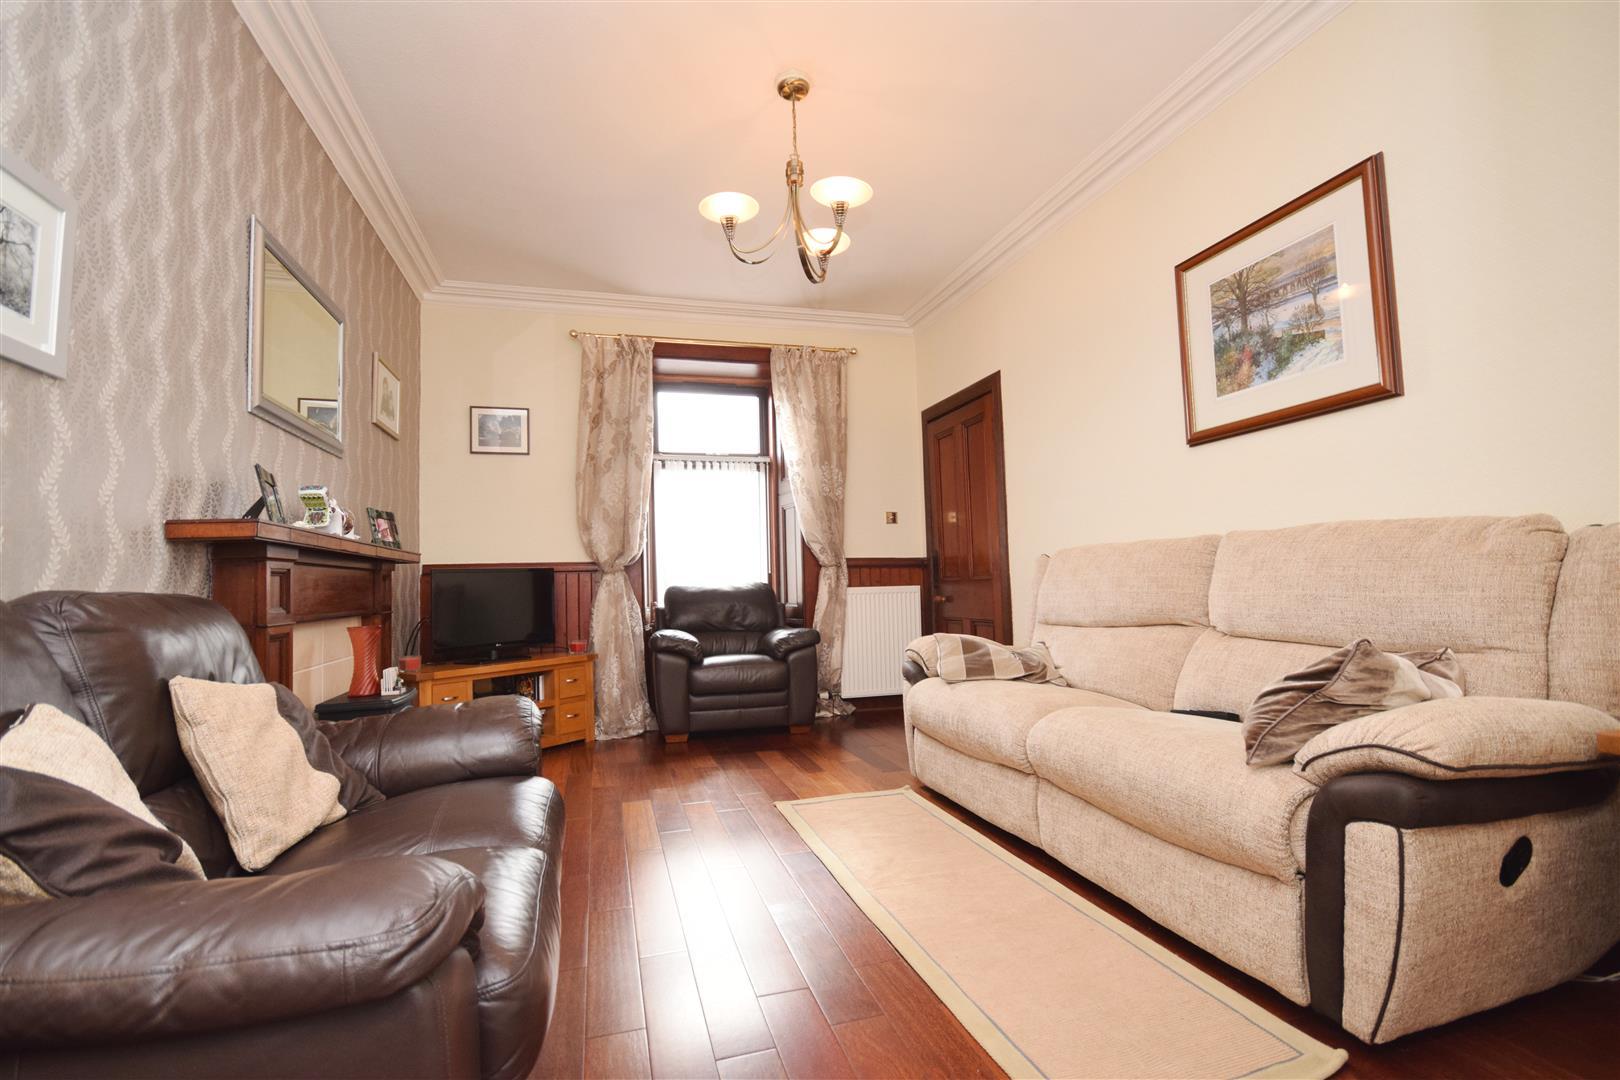 Dalrosa, High Street, Burrelton, Perthshire, PH13 9NS, UK